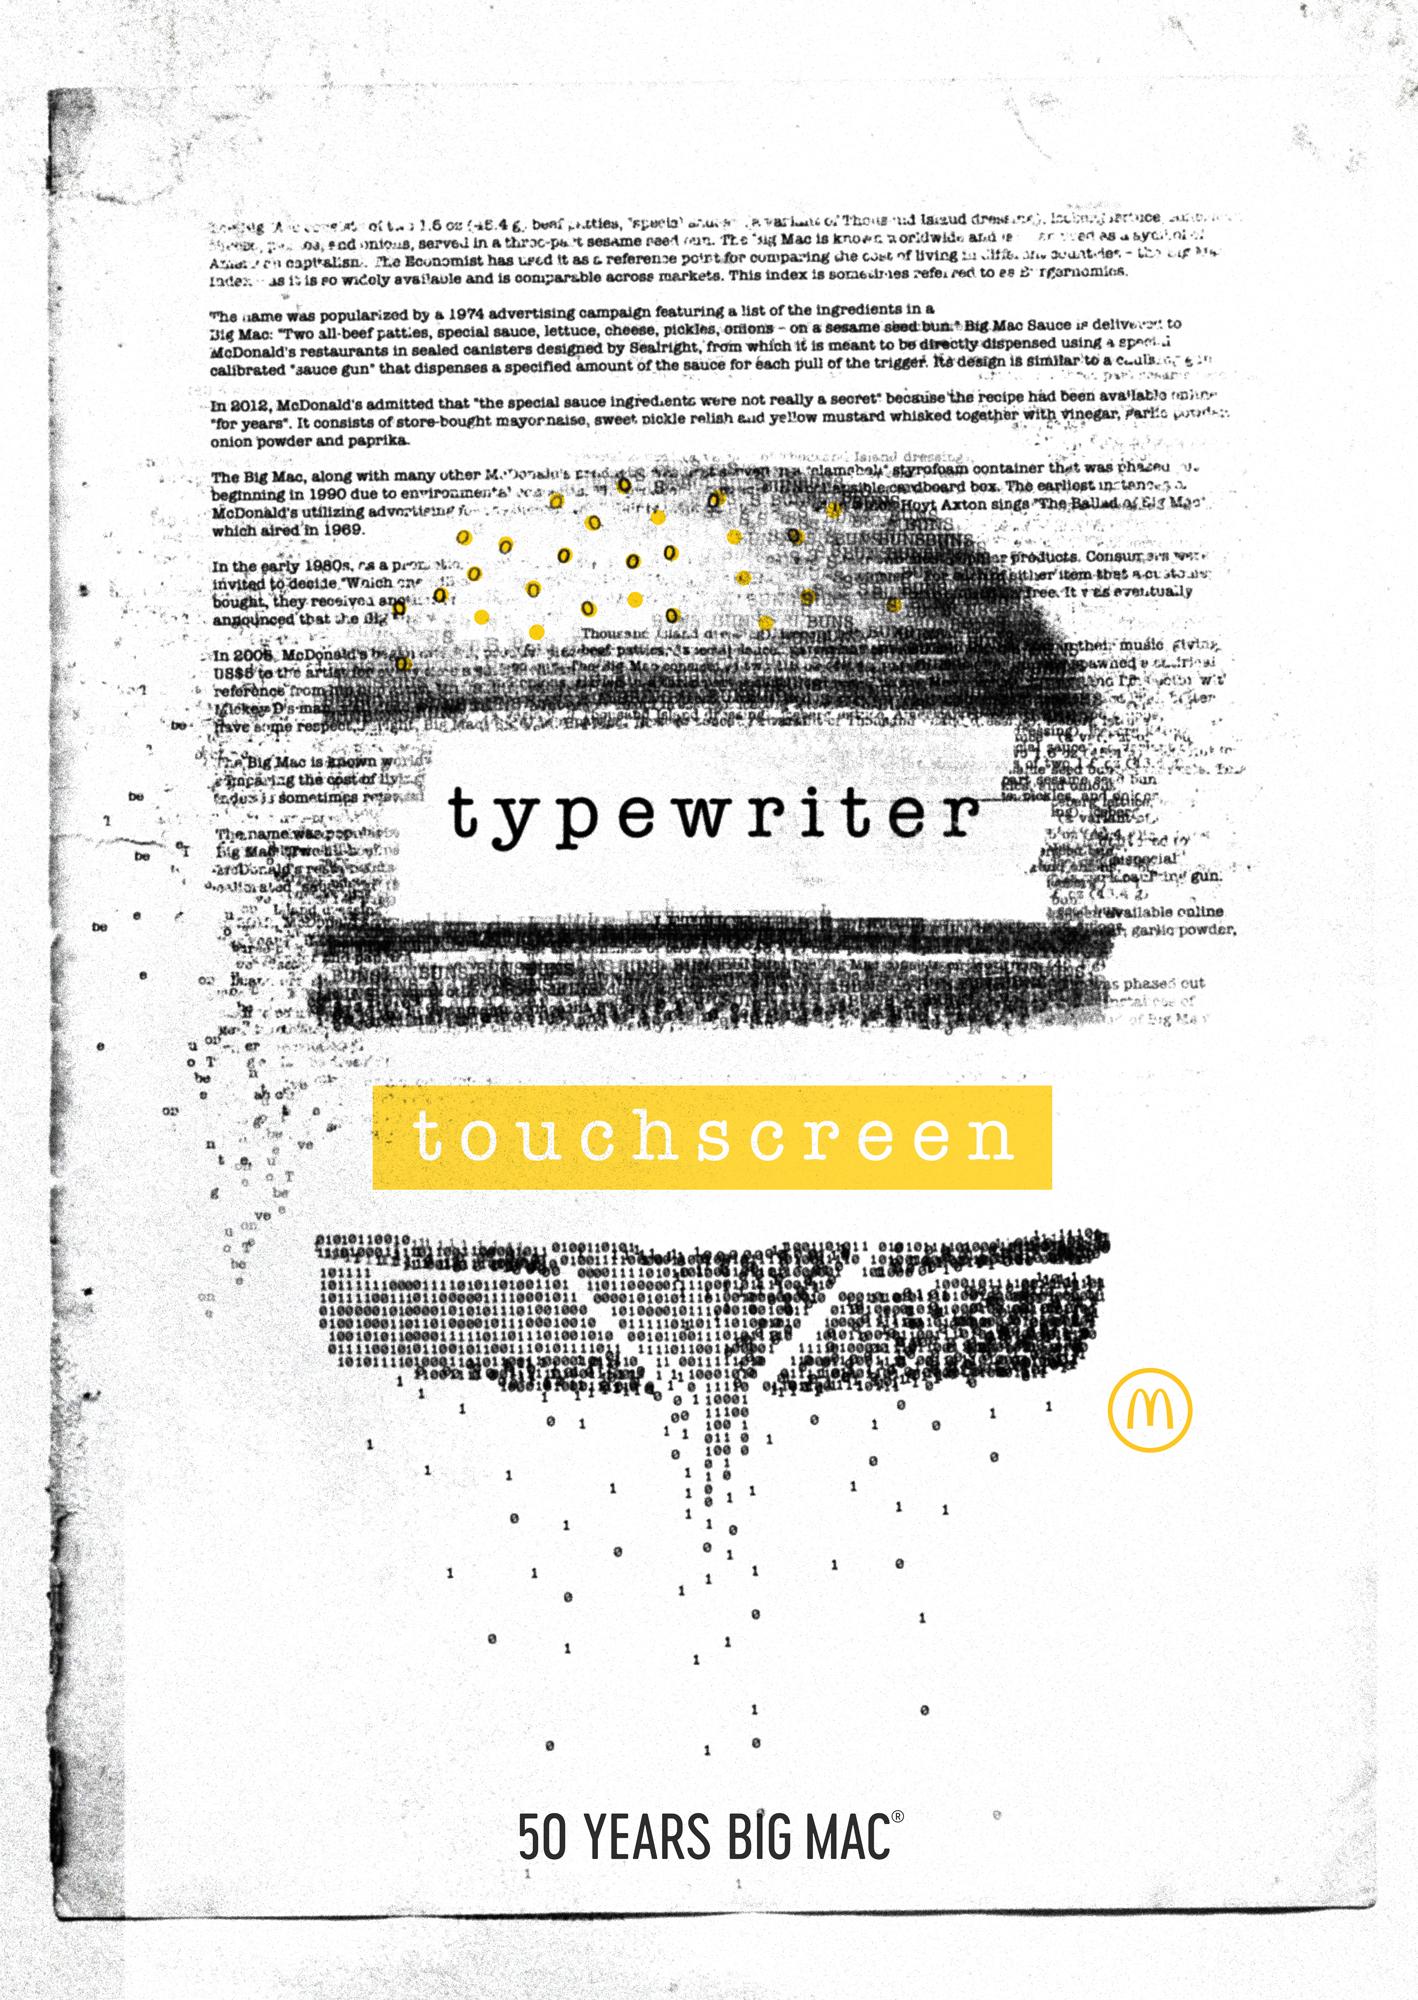 39_Typwriter_Touchscreen.jpg